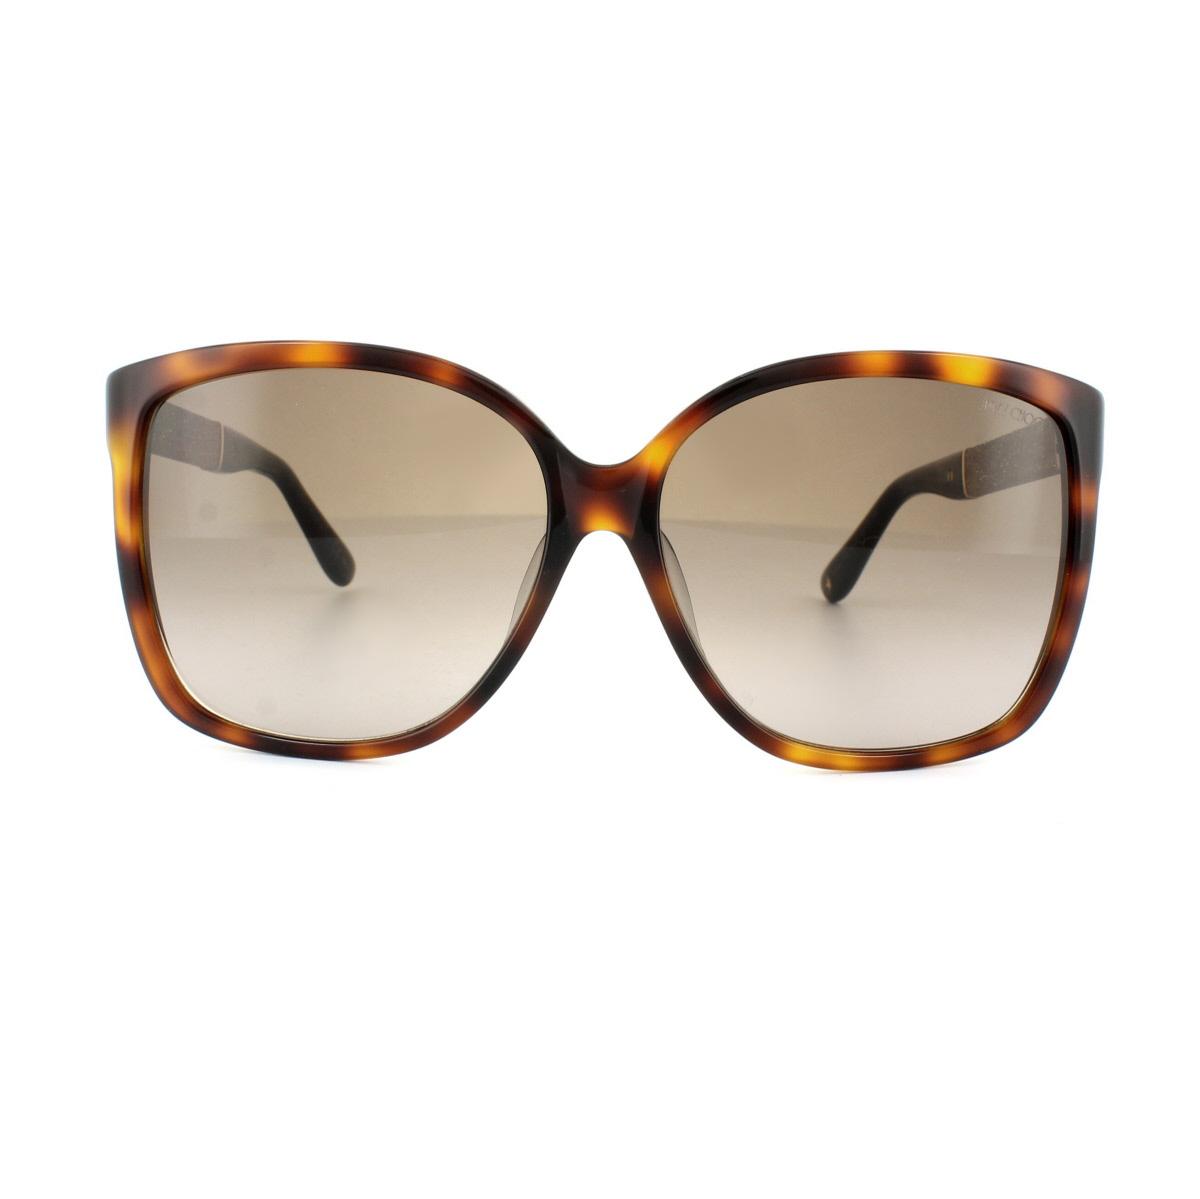 cheap jimmy choo sunglasses jp6l  Jimmy Choo Carly Sunglasses Thumbnail 1 Jimmy Choo Carly Sunglasses  Thumbnail 2